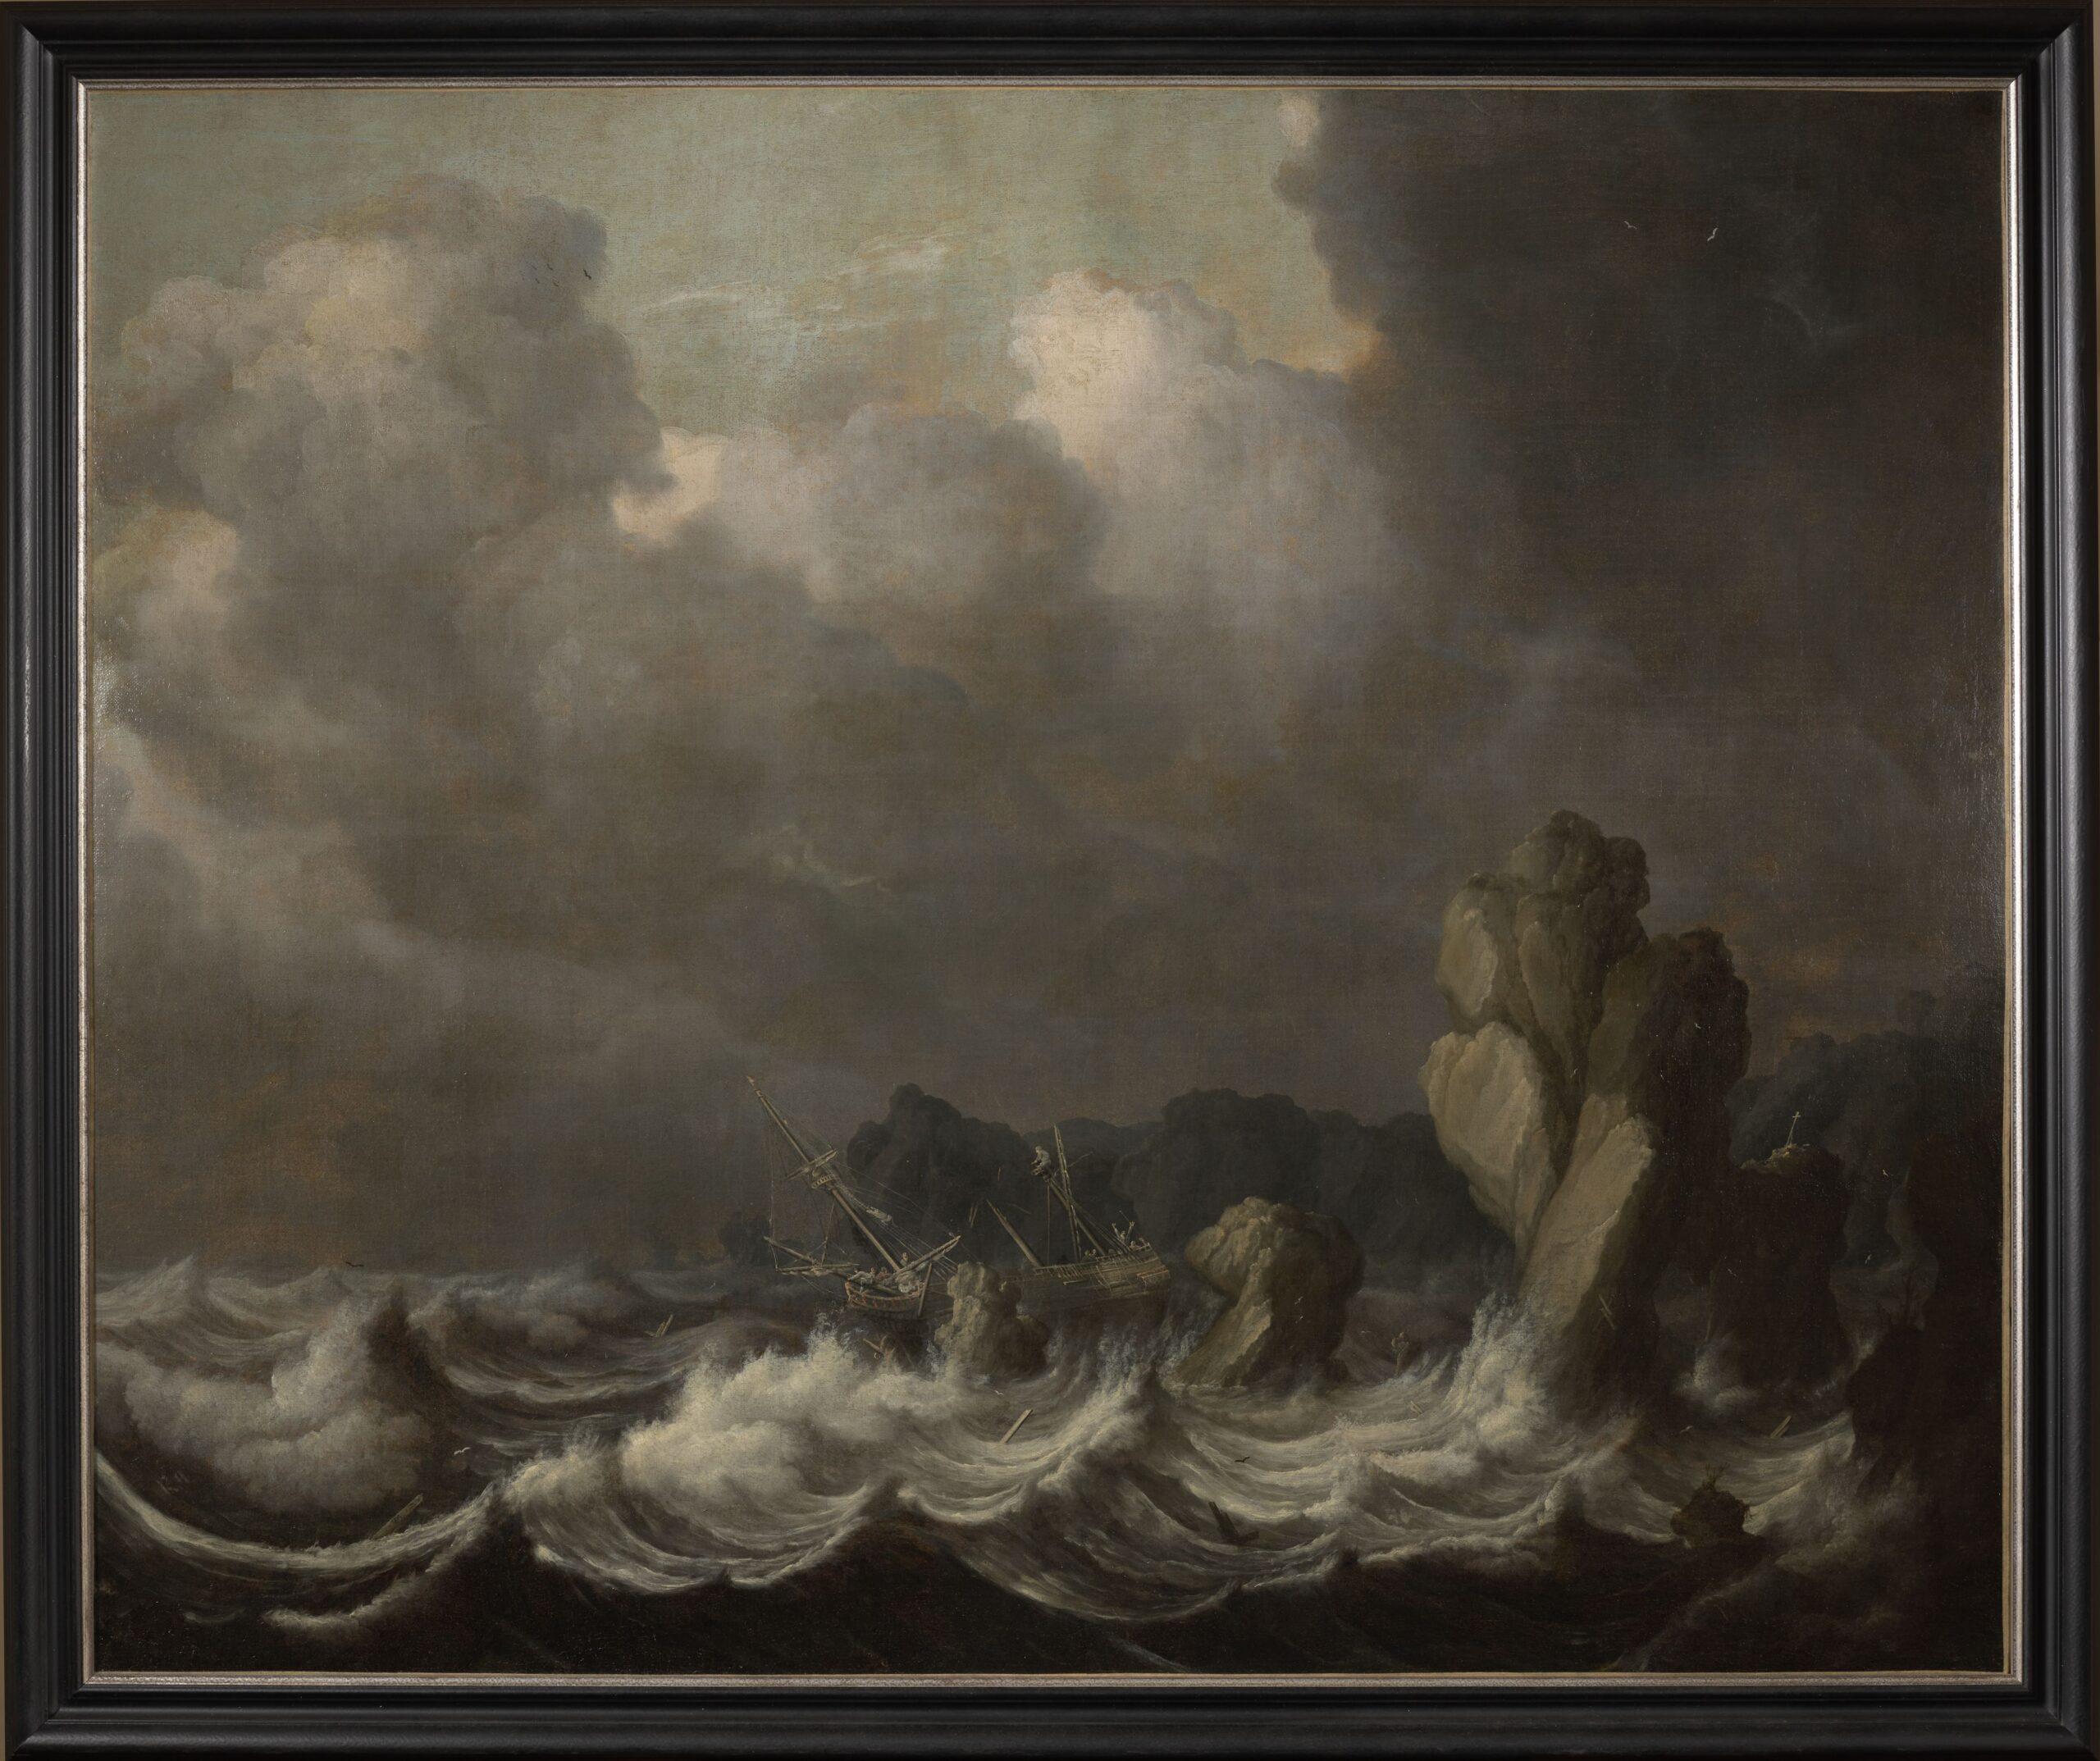 Fig. 4. Simon de Vlieger (1600/1601–1653), A Shipwreck, ca. 1630, inv. MJA 250